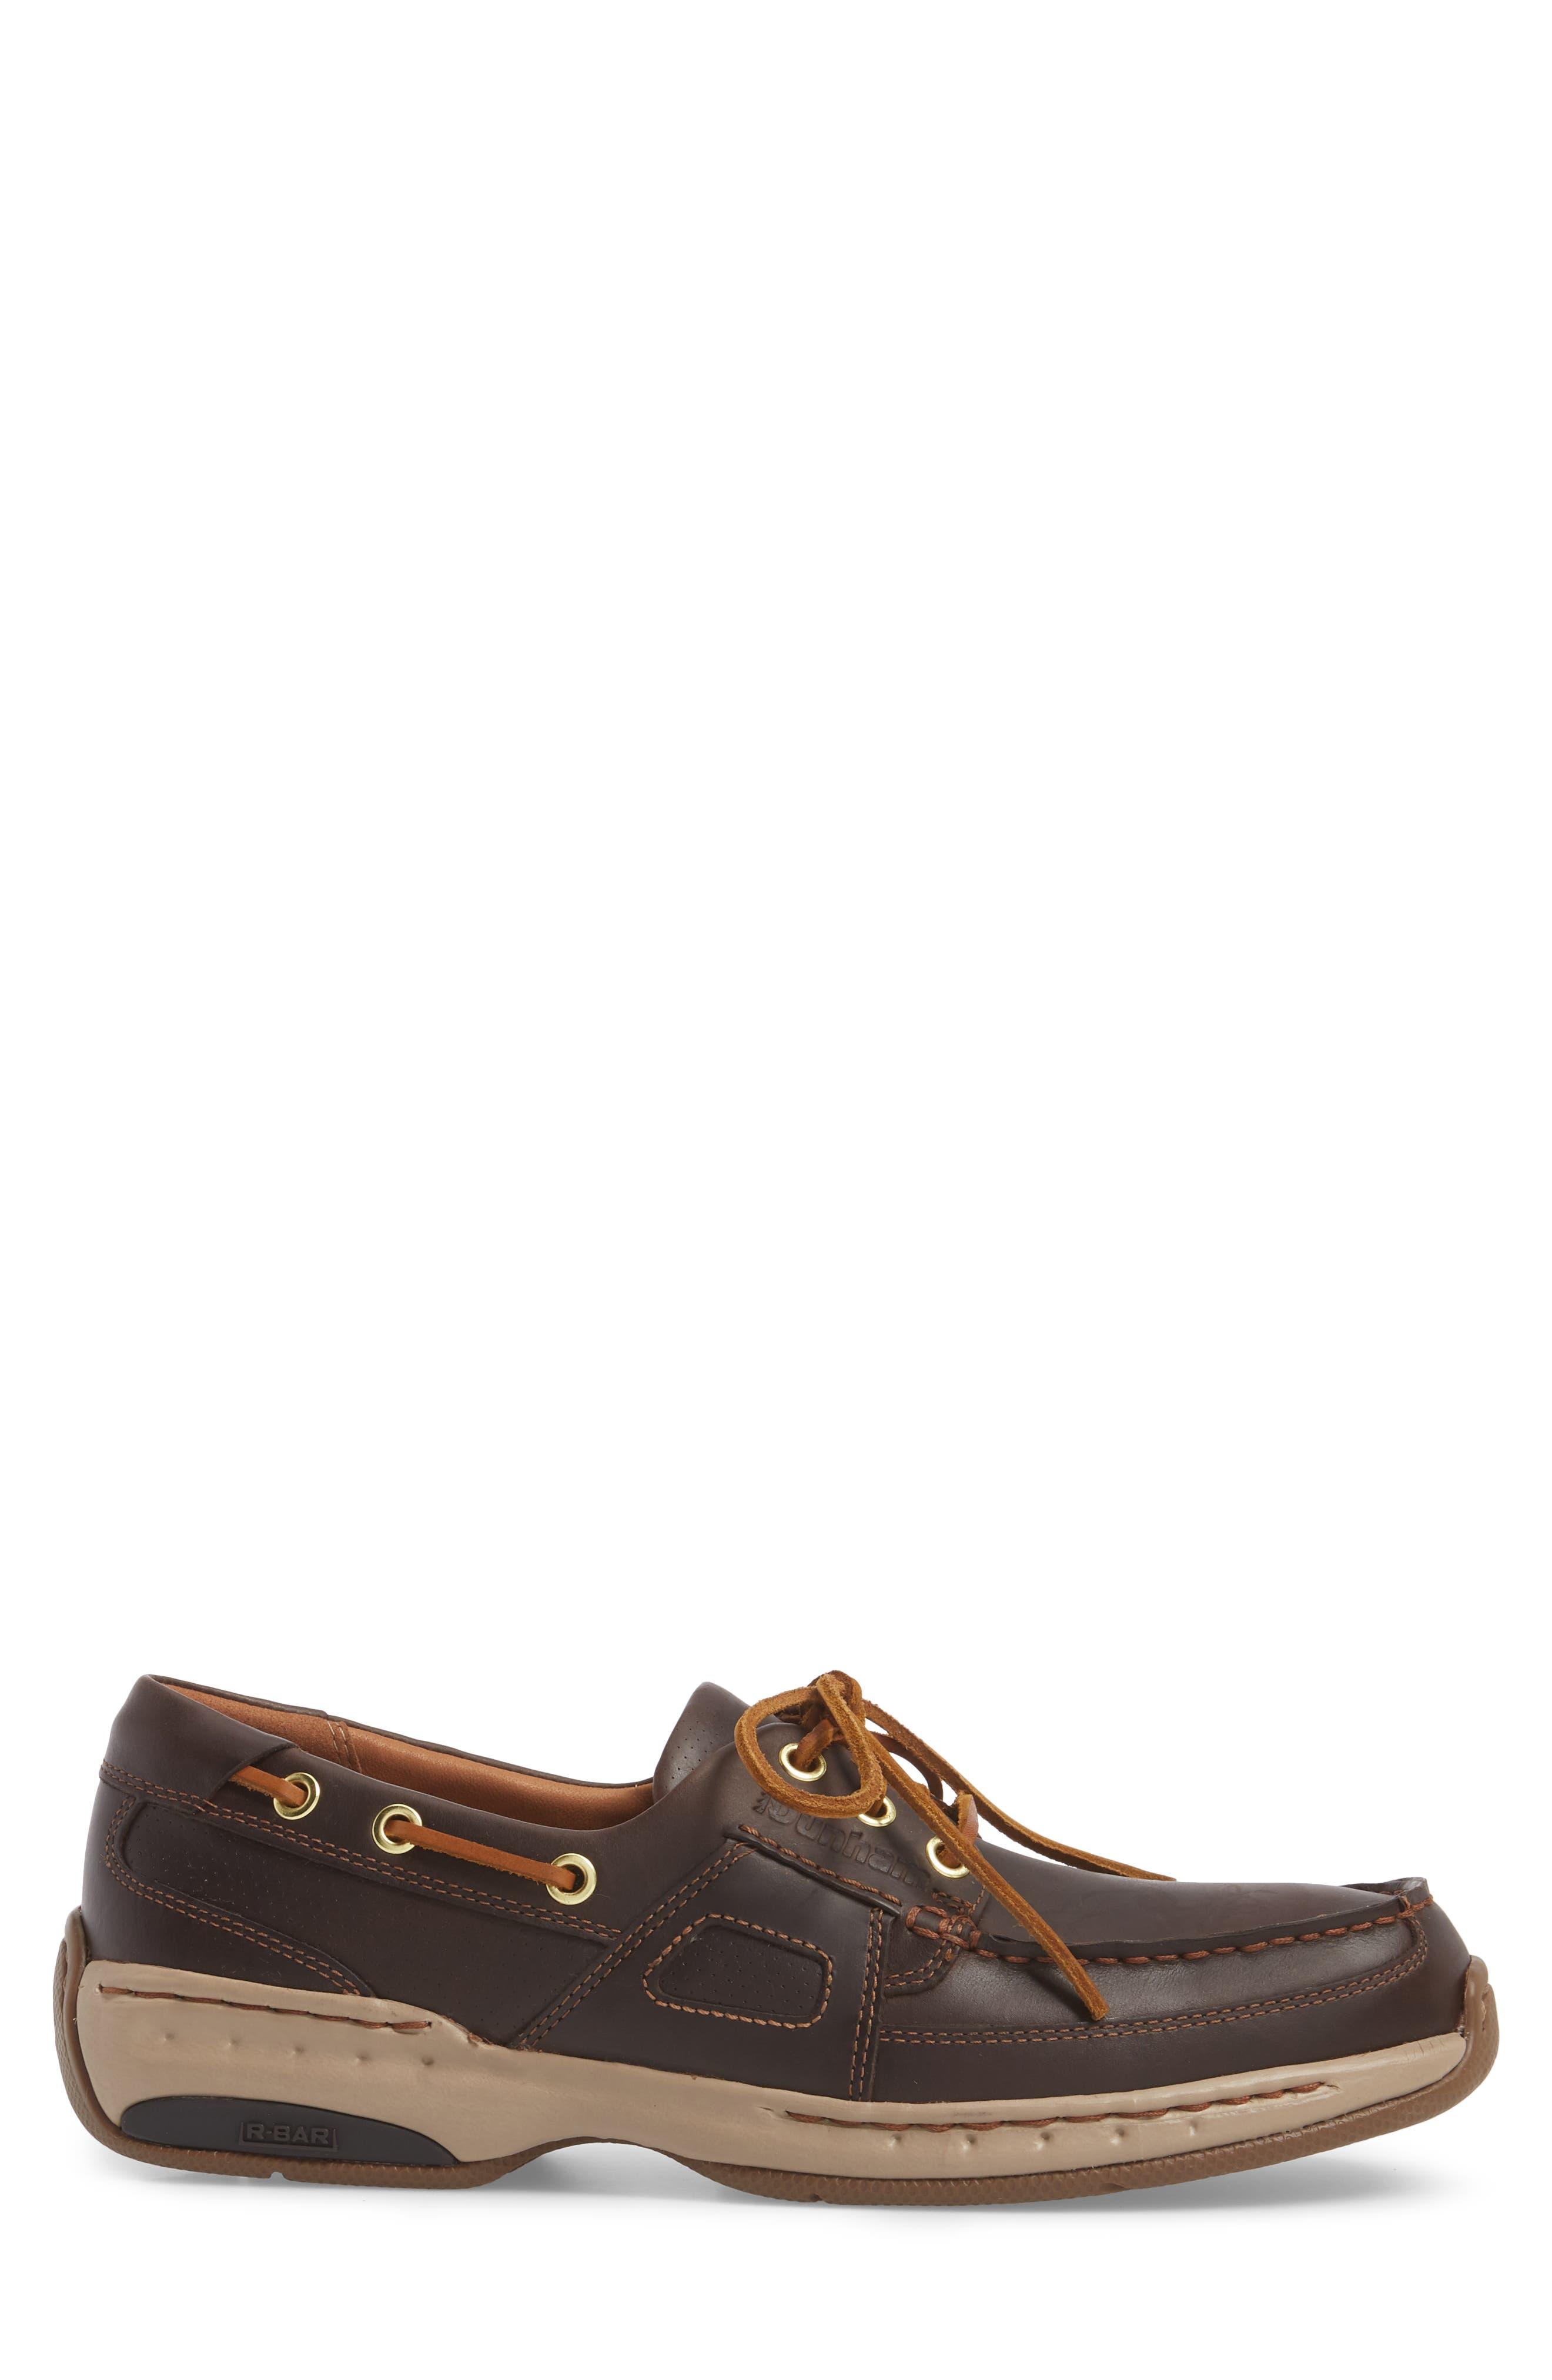 LTD Water Resistant Boat Shoe,                             Alternate thumbnail 3, color,                             Tan Leather